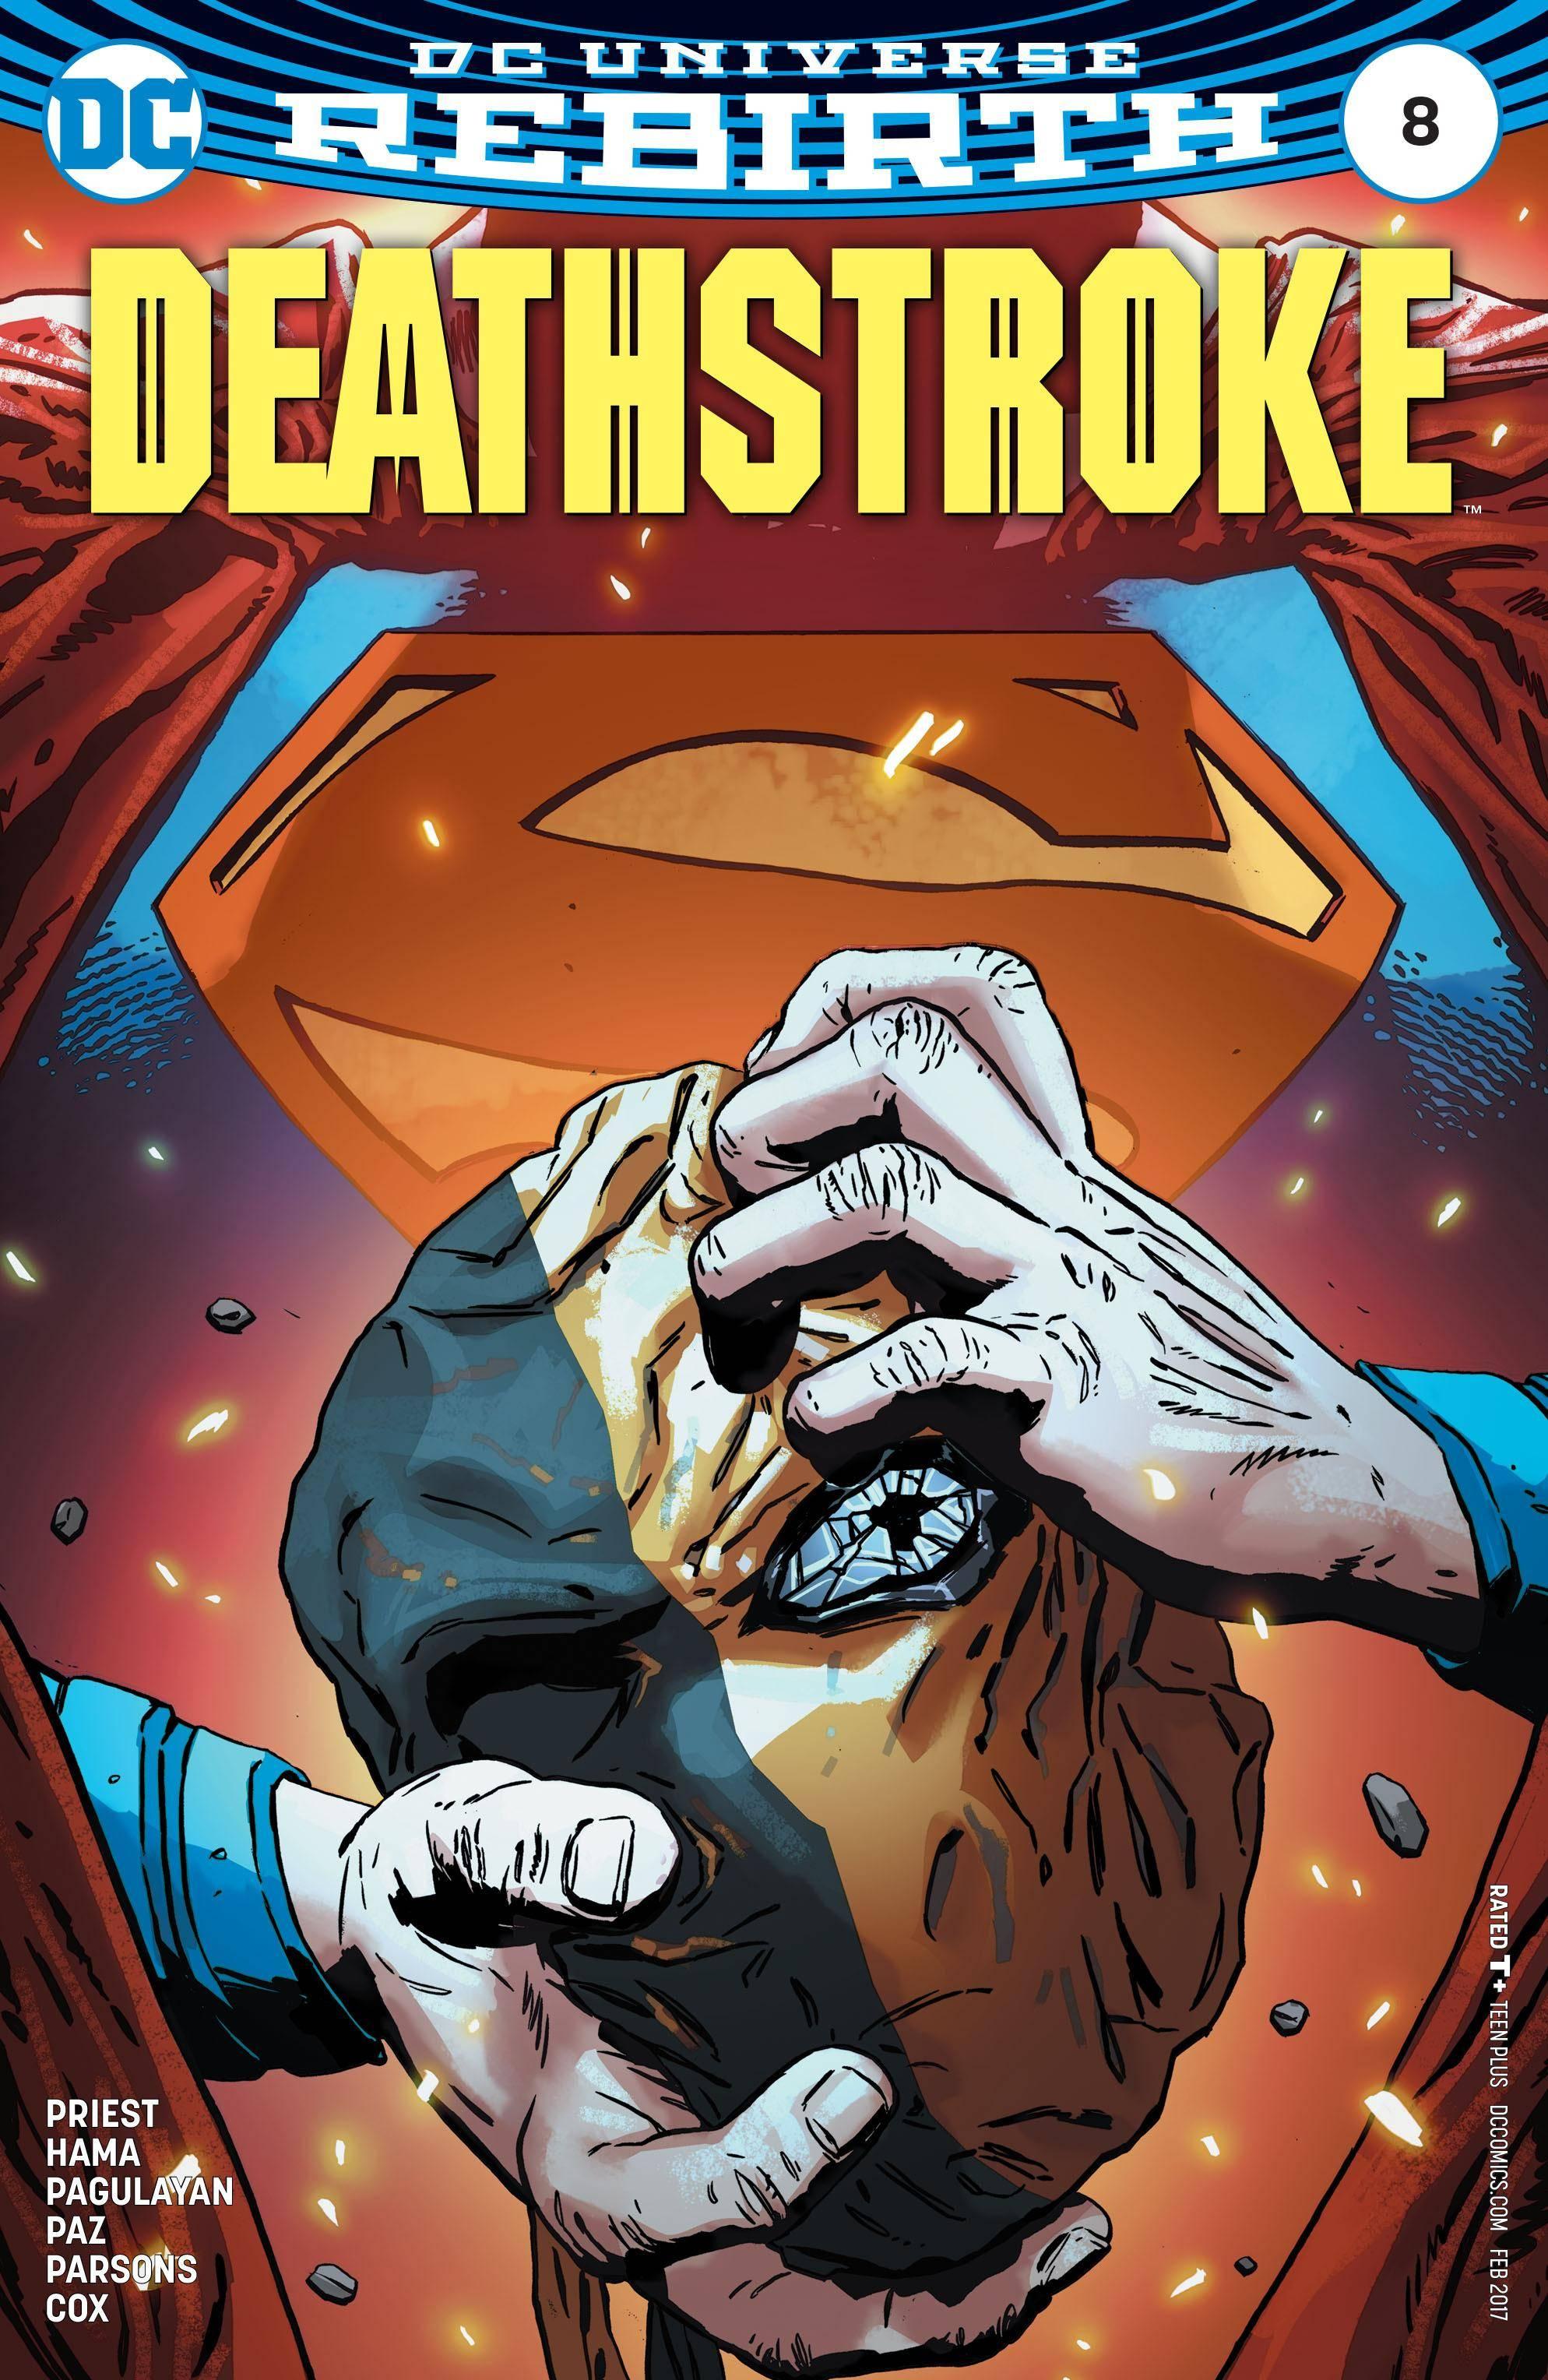 Deathstroke 008 2017 2 covers Digital Zone-Empire